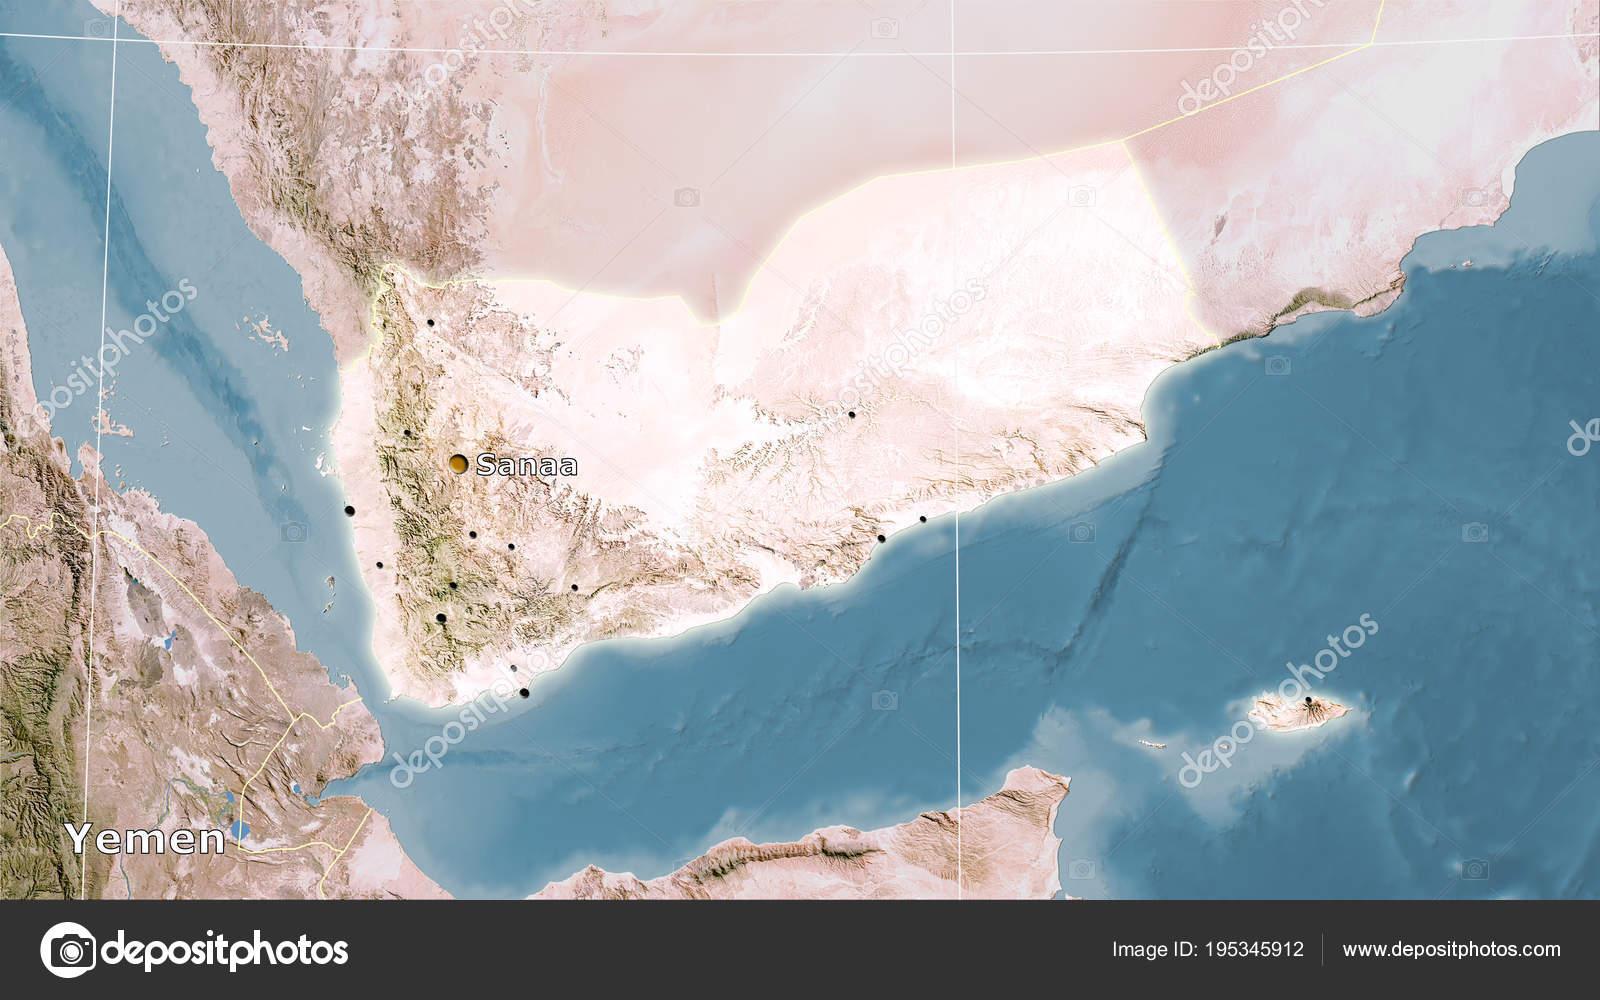 Yemen, satellite C - composition — Stock Photo © Yarr65 ... on detailed map of yemen, road map of yemen, outline map of yemen, terrain map of yemen, political map of yemen, physical map of yemen, topographic map of yemen,